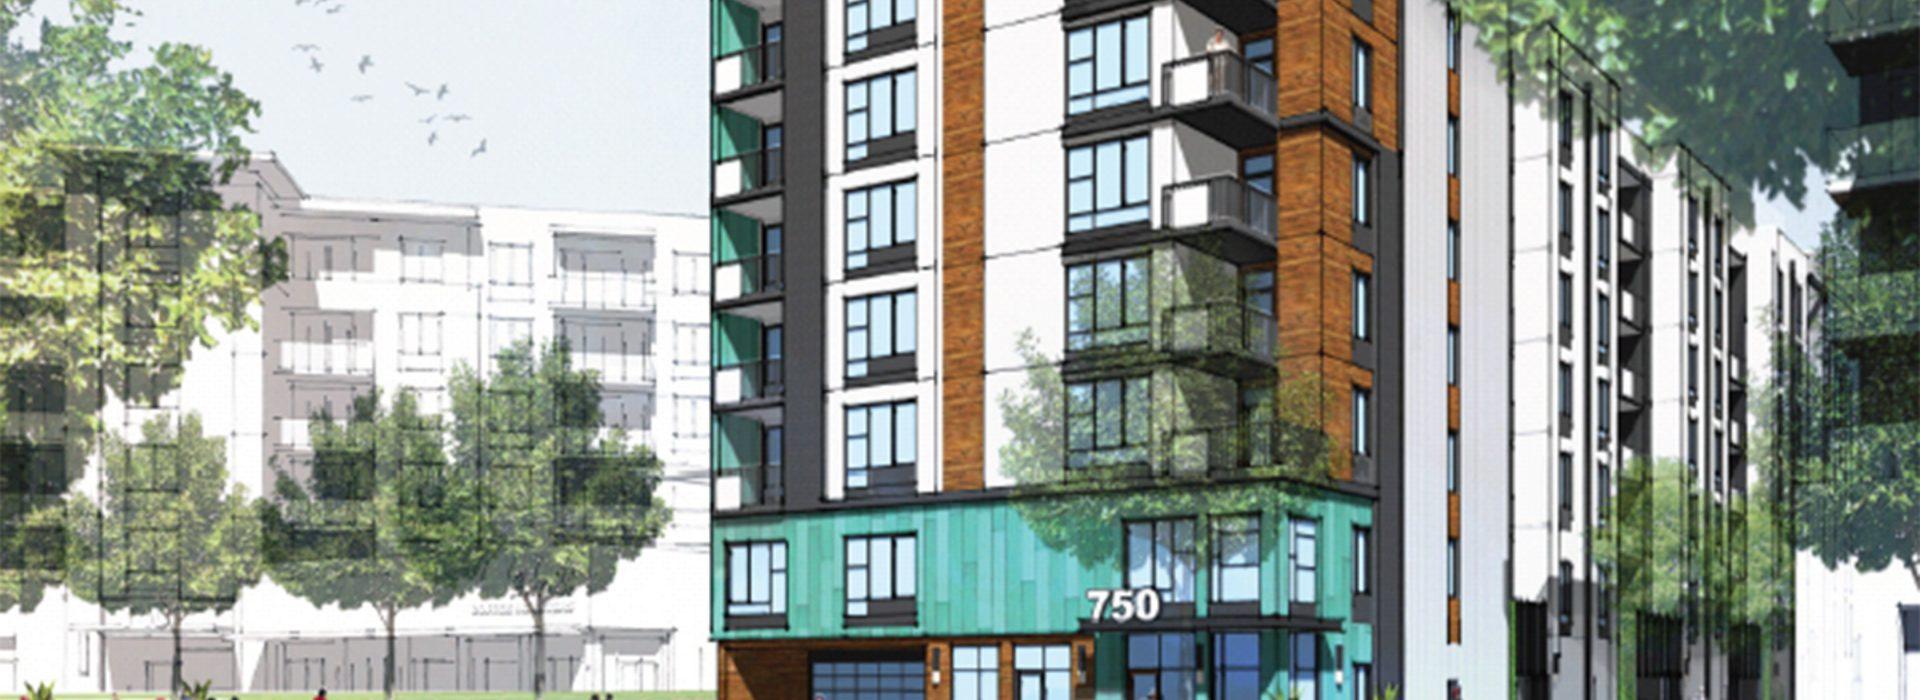 Mariposa Place design 1